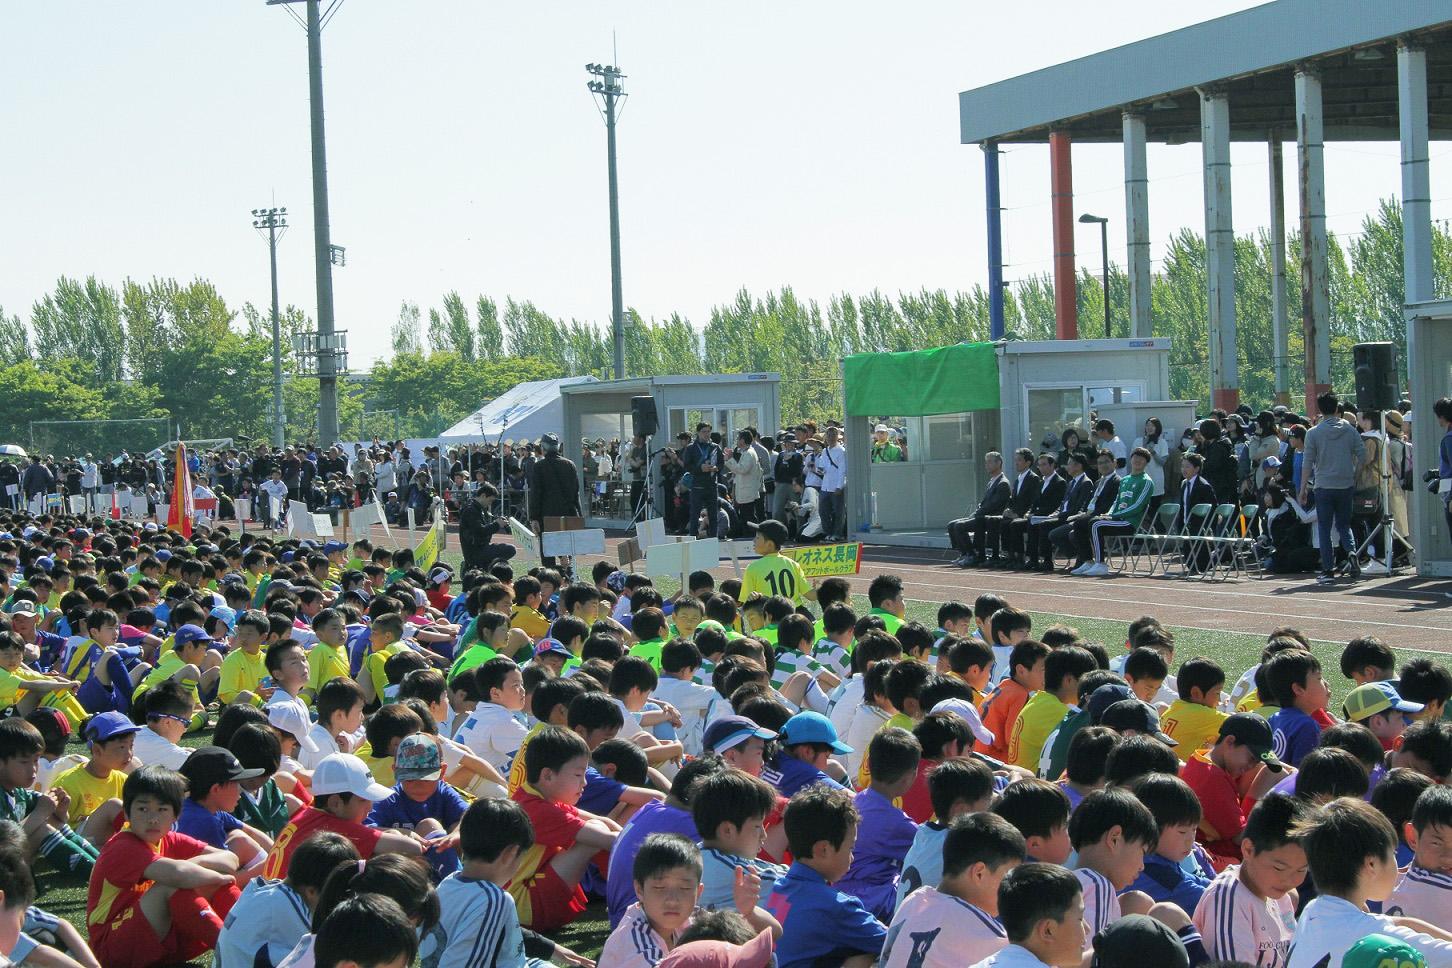 TeNYちびっこミニサッカーフェスタU-10開会式の様子